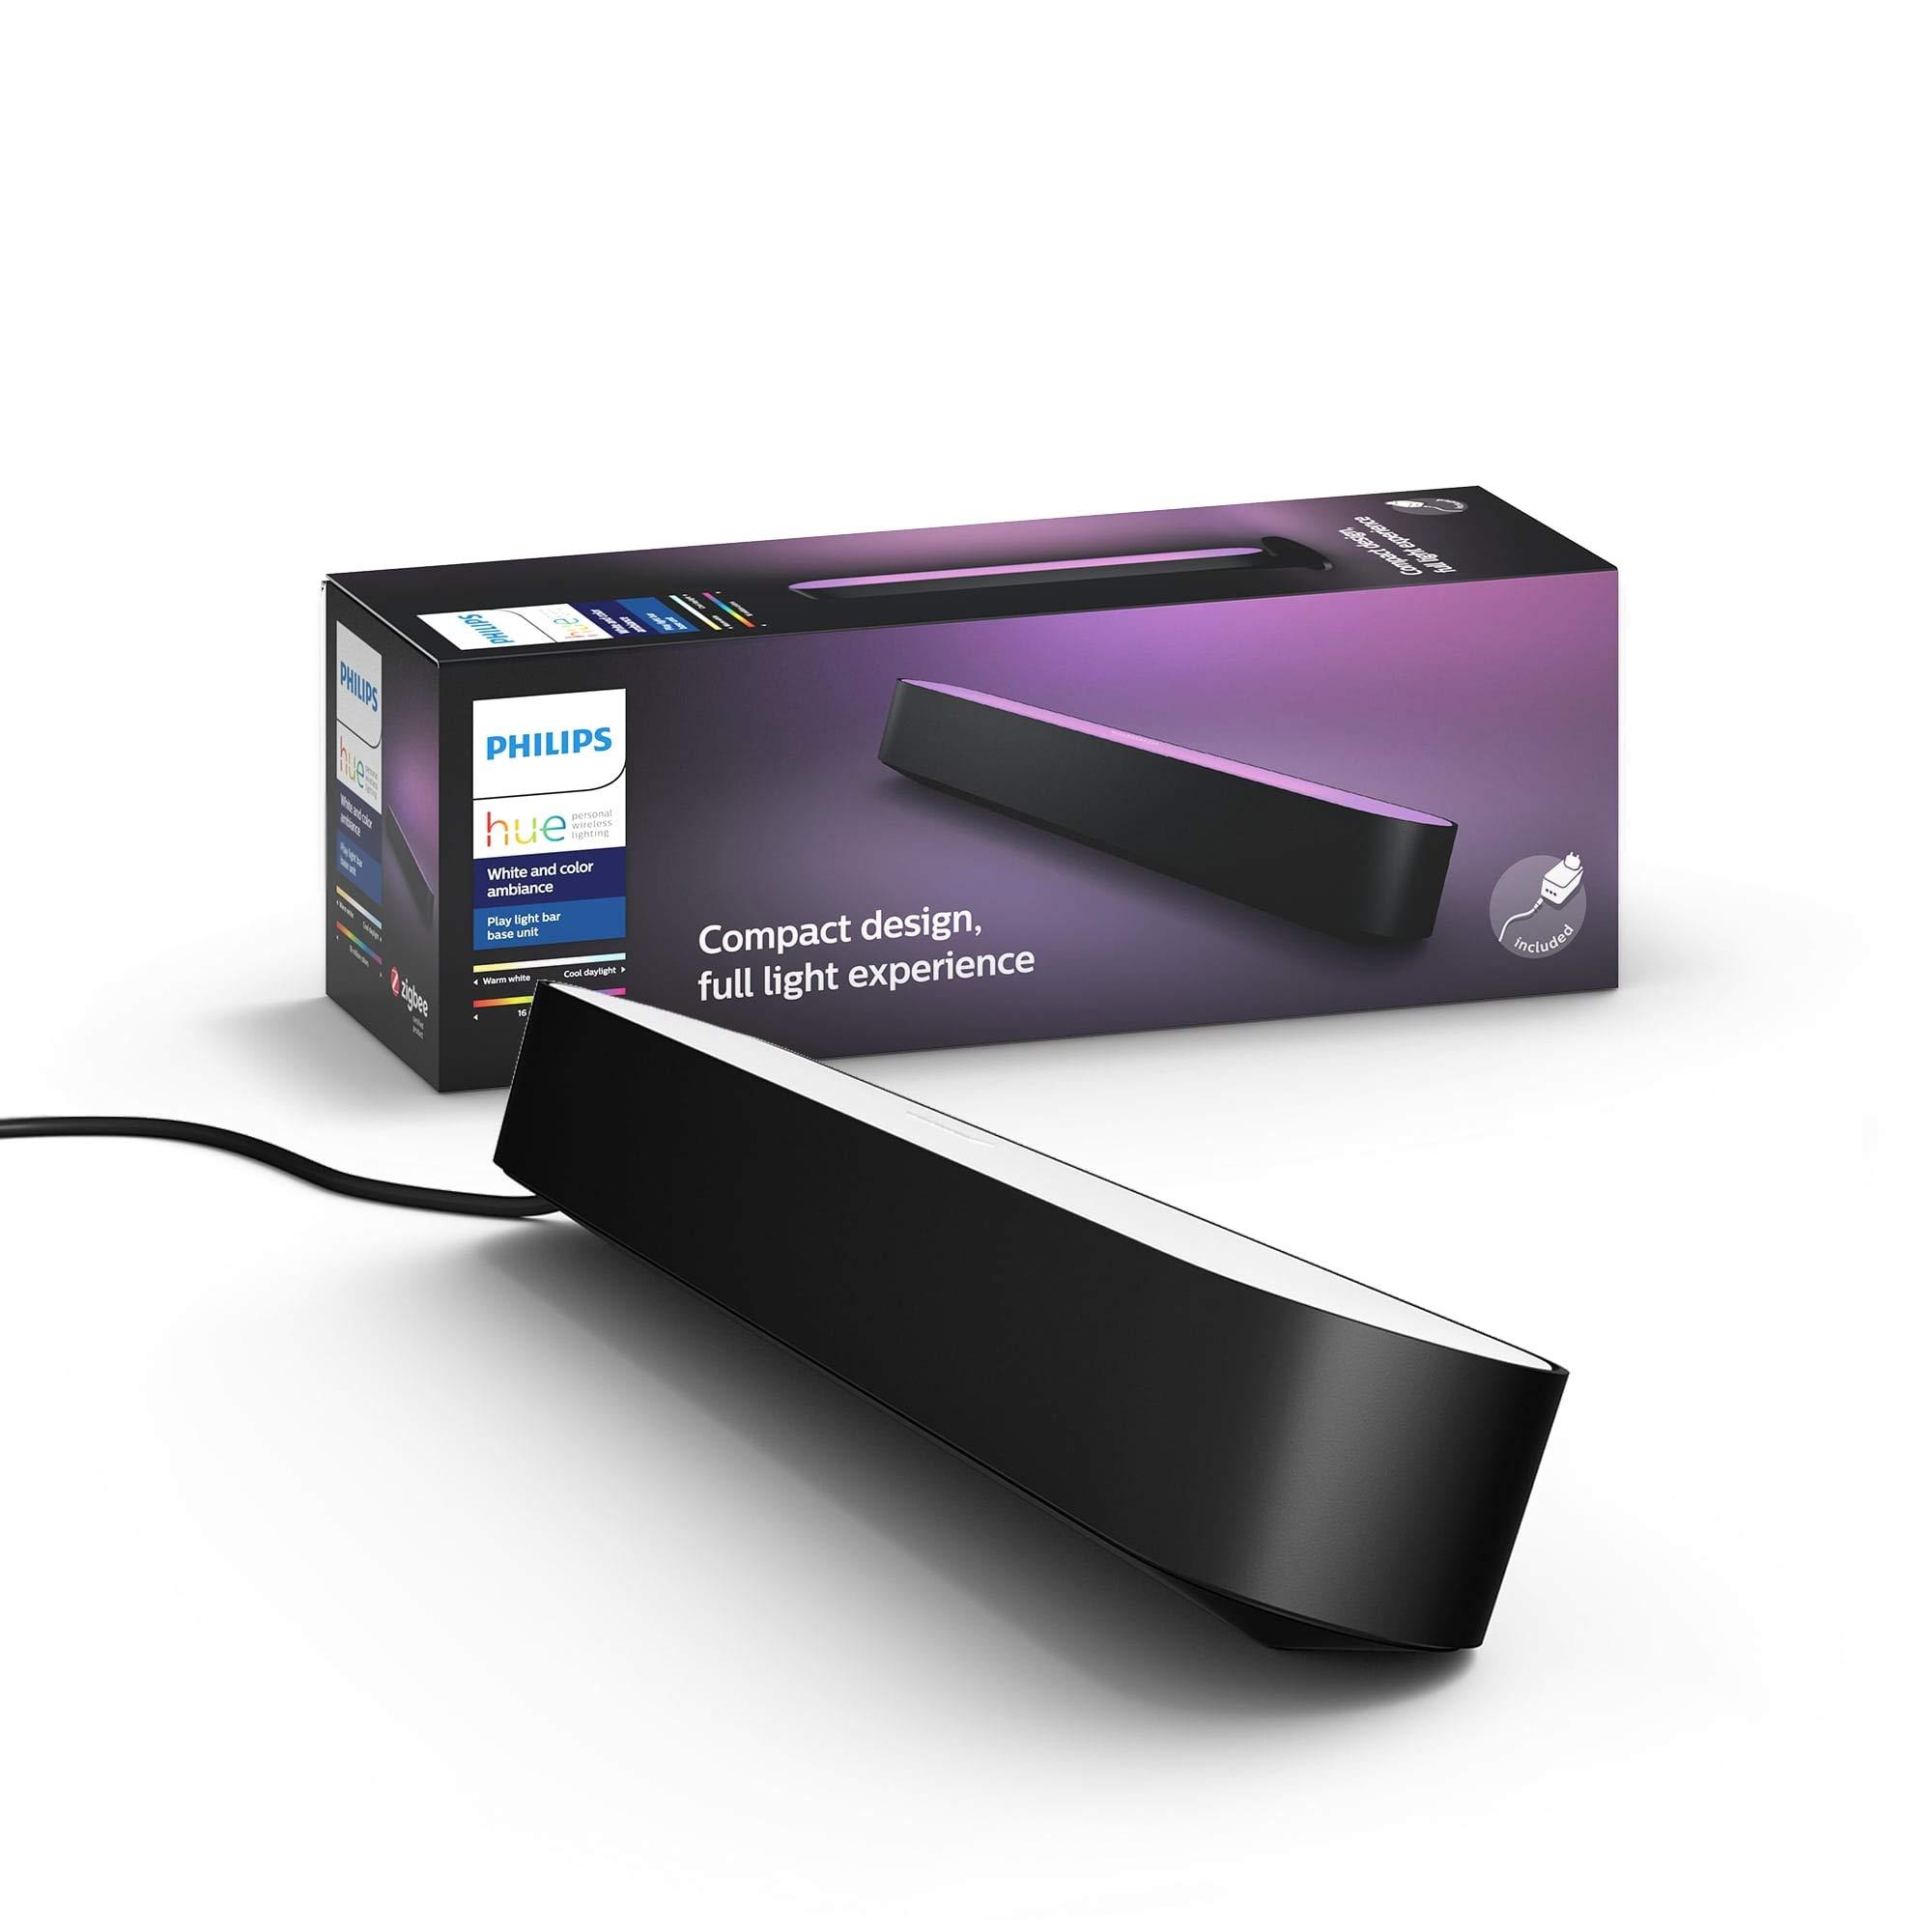 Philips Hue Smart Hub Works With Alexa Apple Homekit And